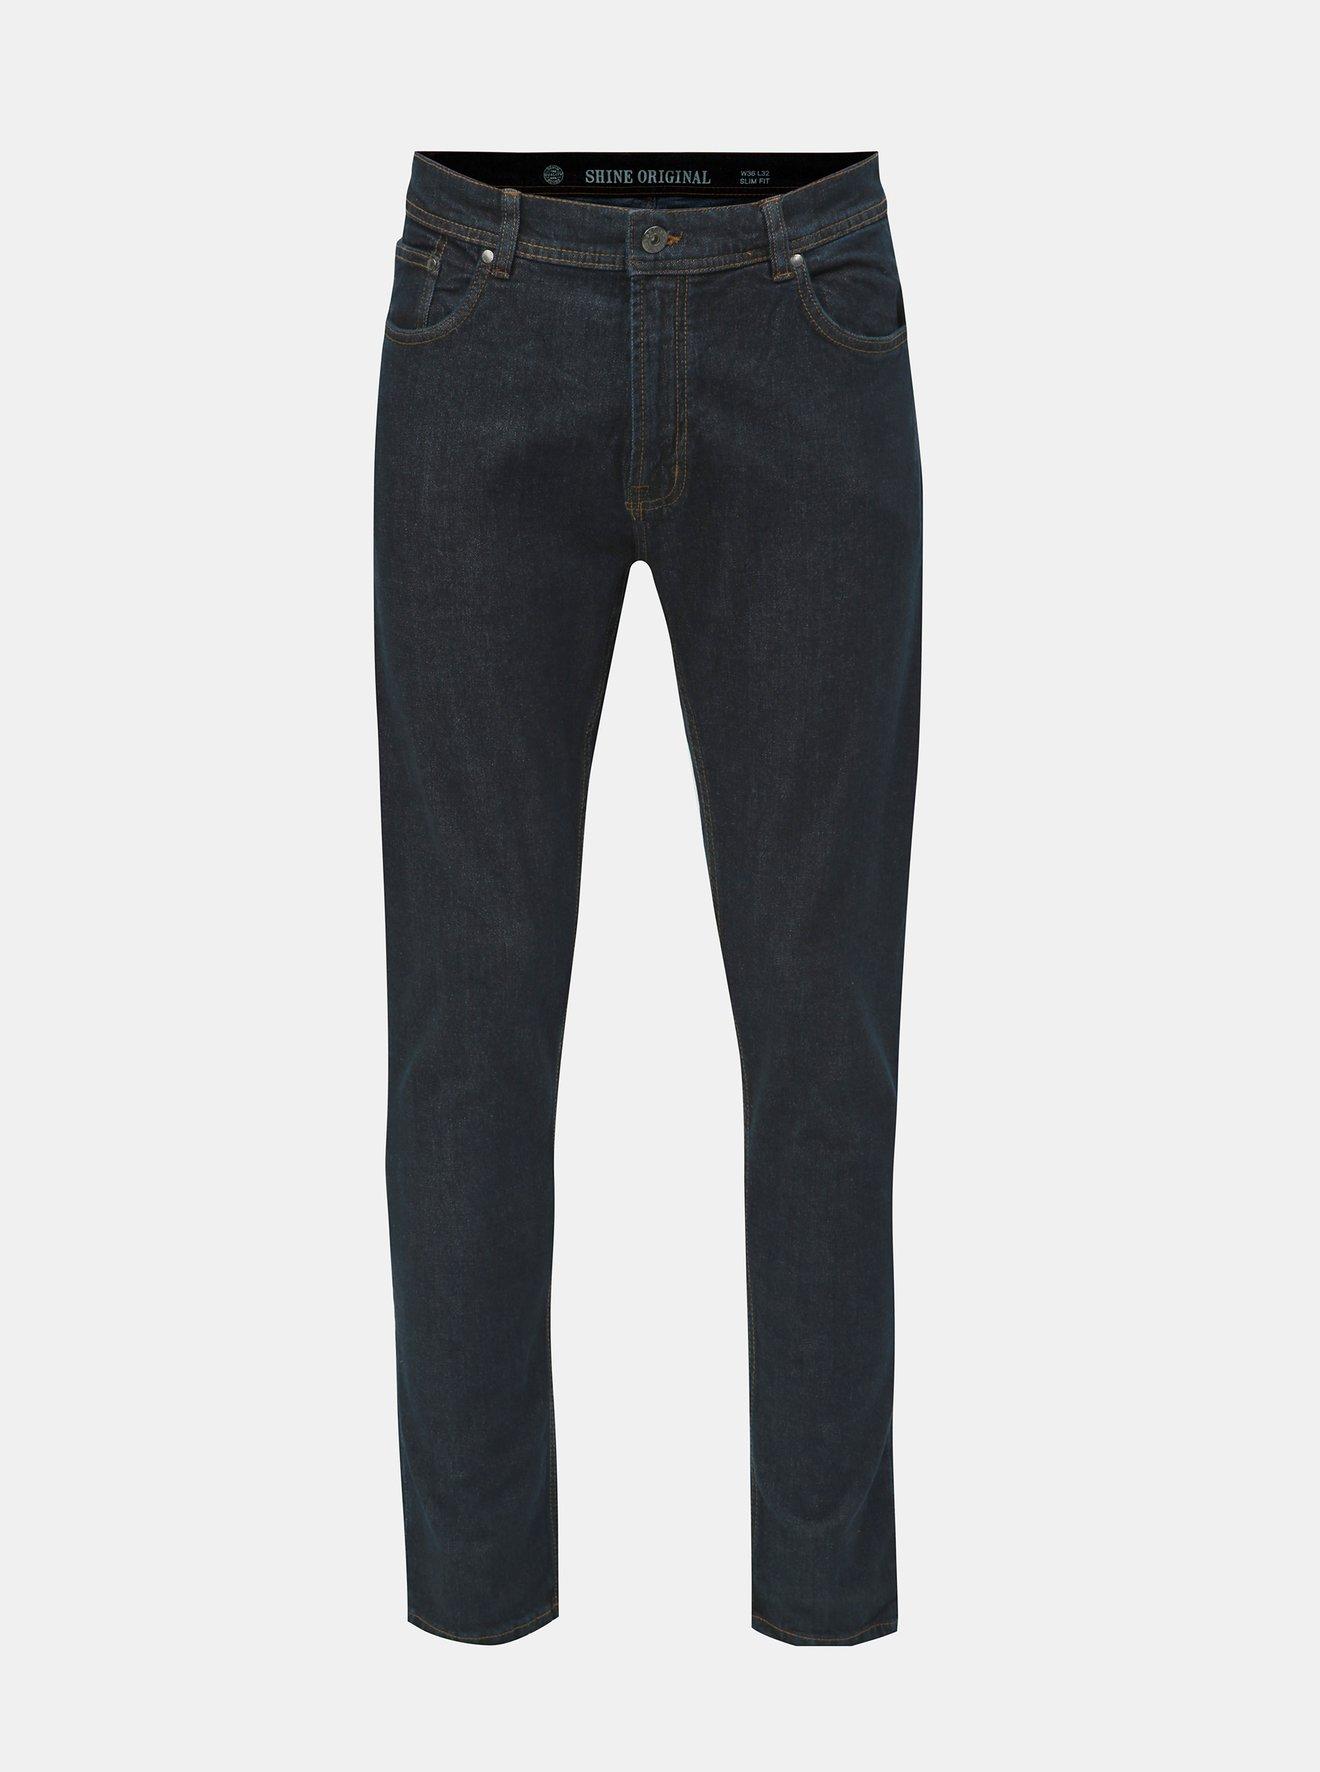 Tmavě modré slim fit džíny Shine Original